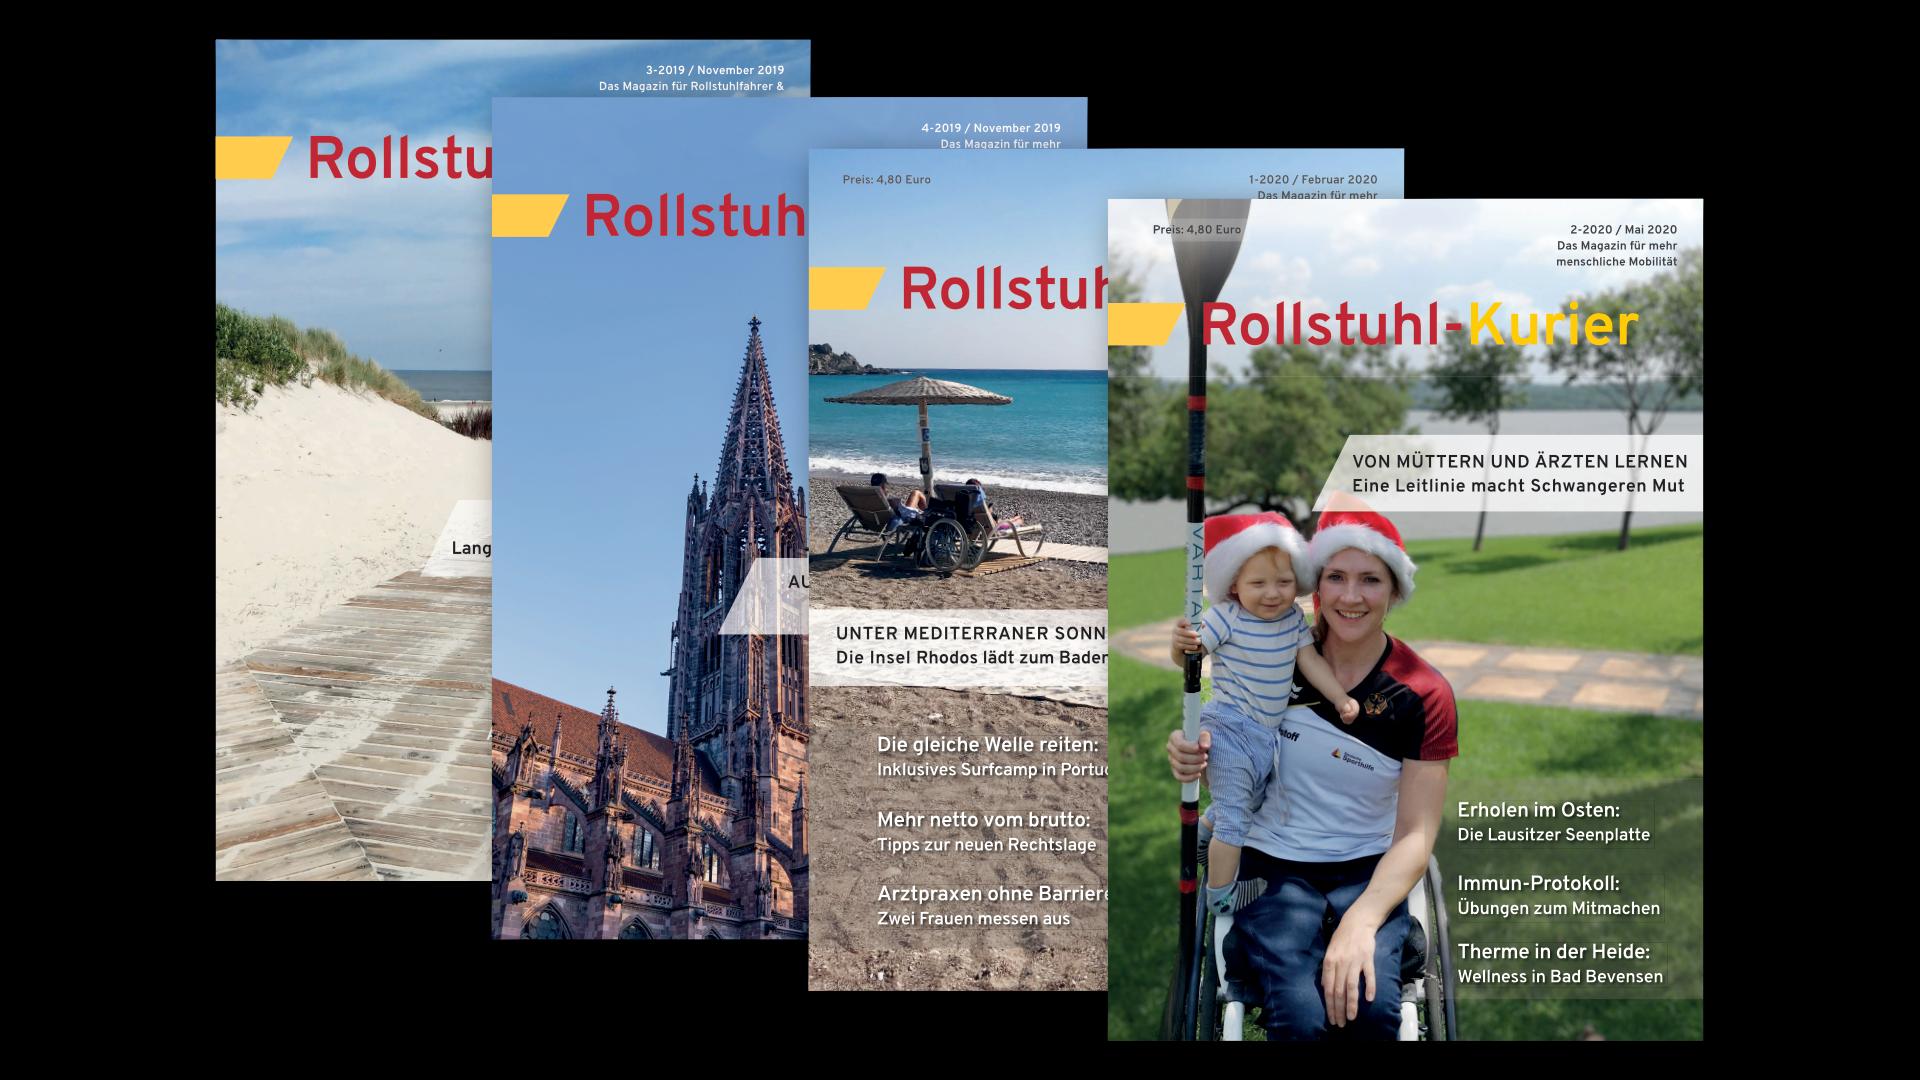 Fotos der Zeitschrift Rollstuhl-Kurier